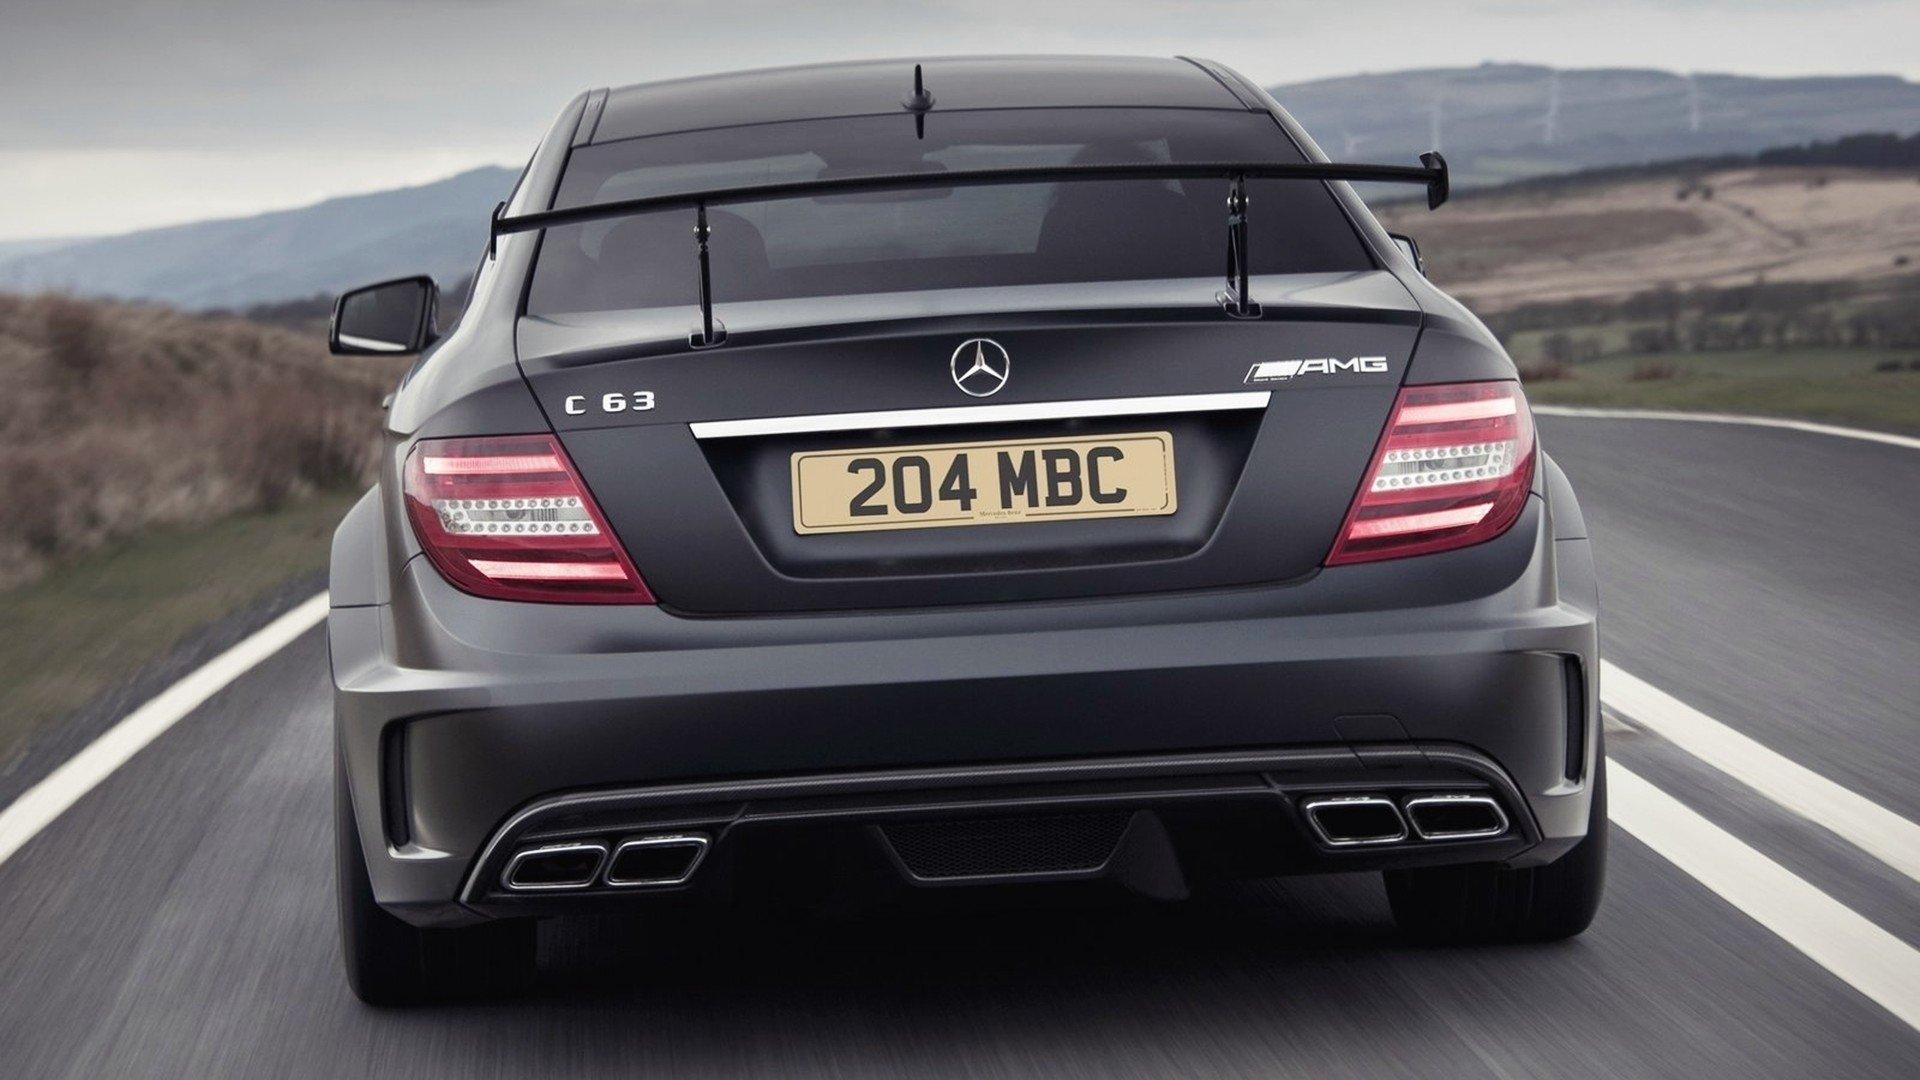 Mercedes Benz C63 Amg Full Hd Wallpaper And Hintergrund